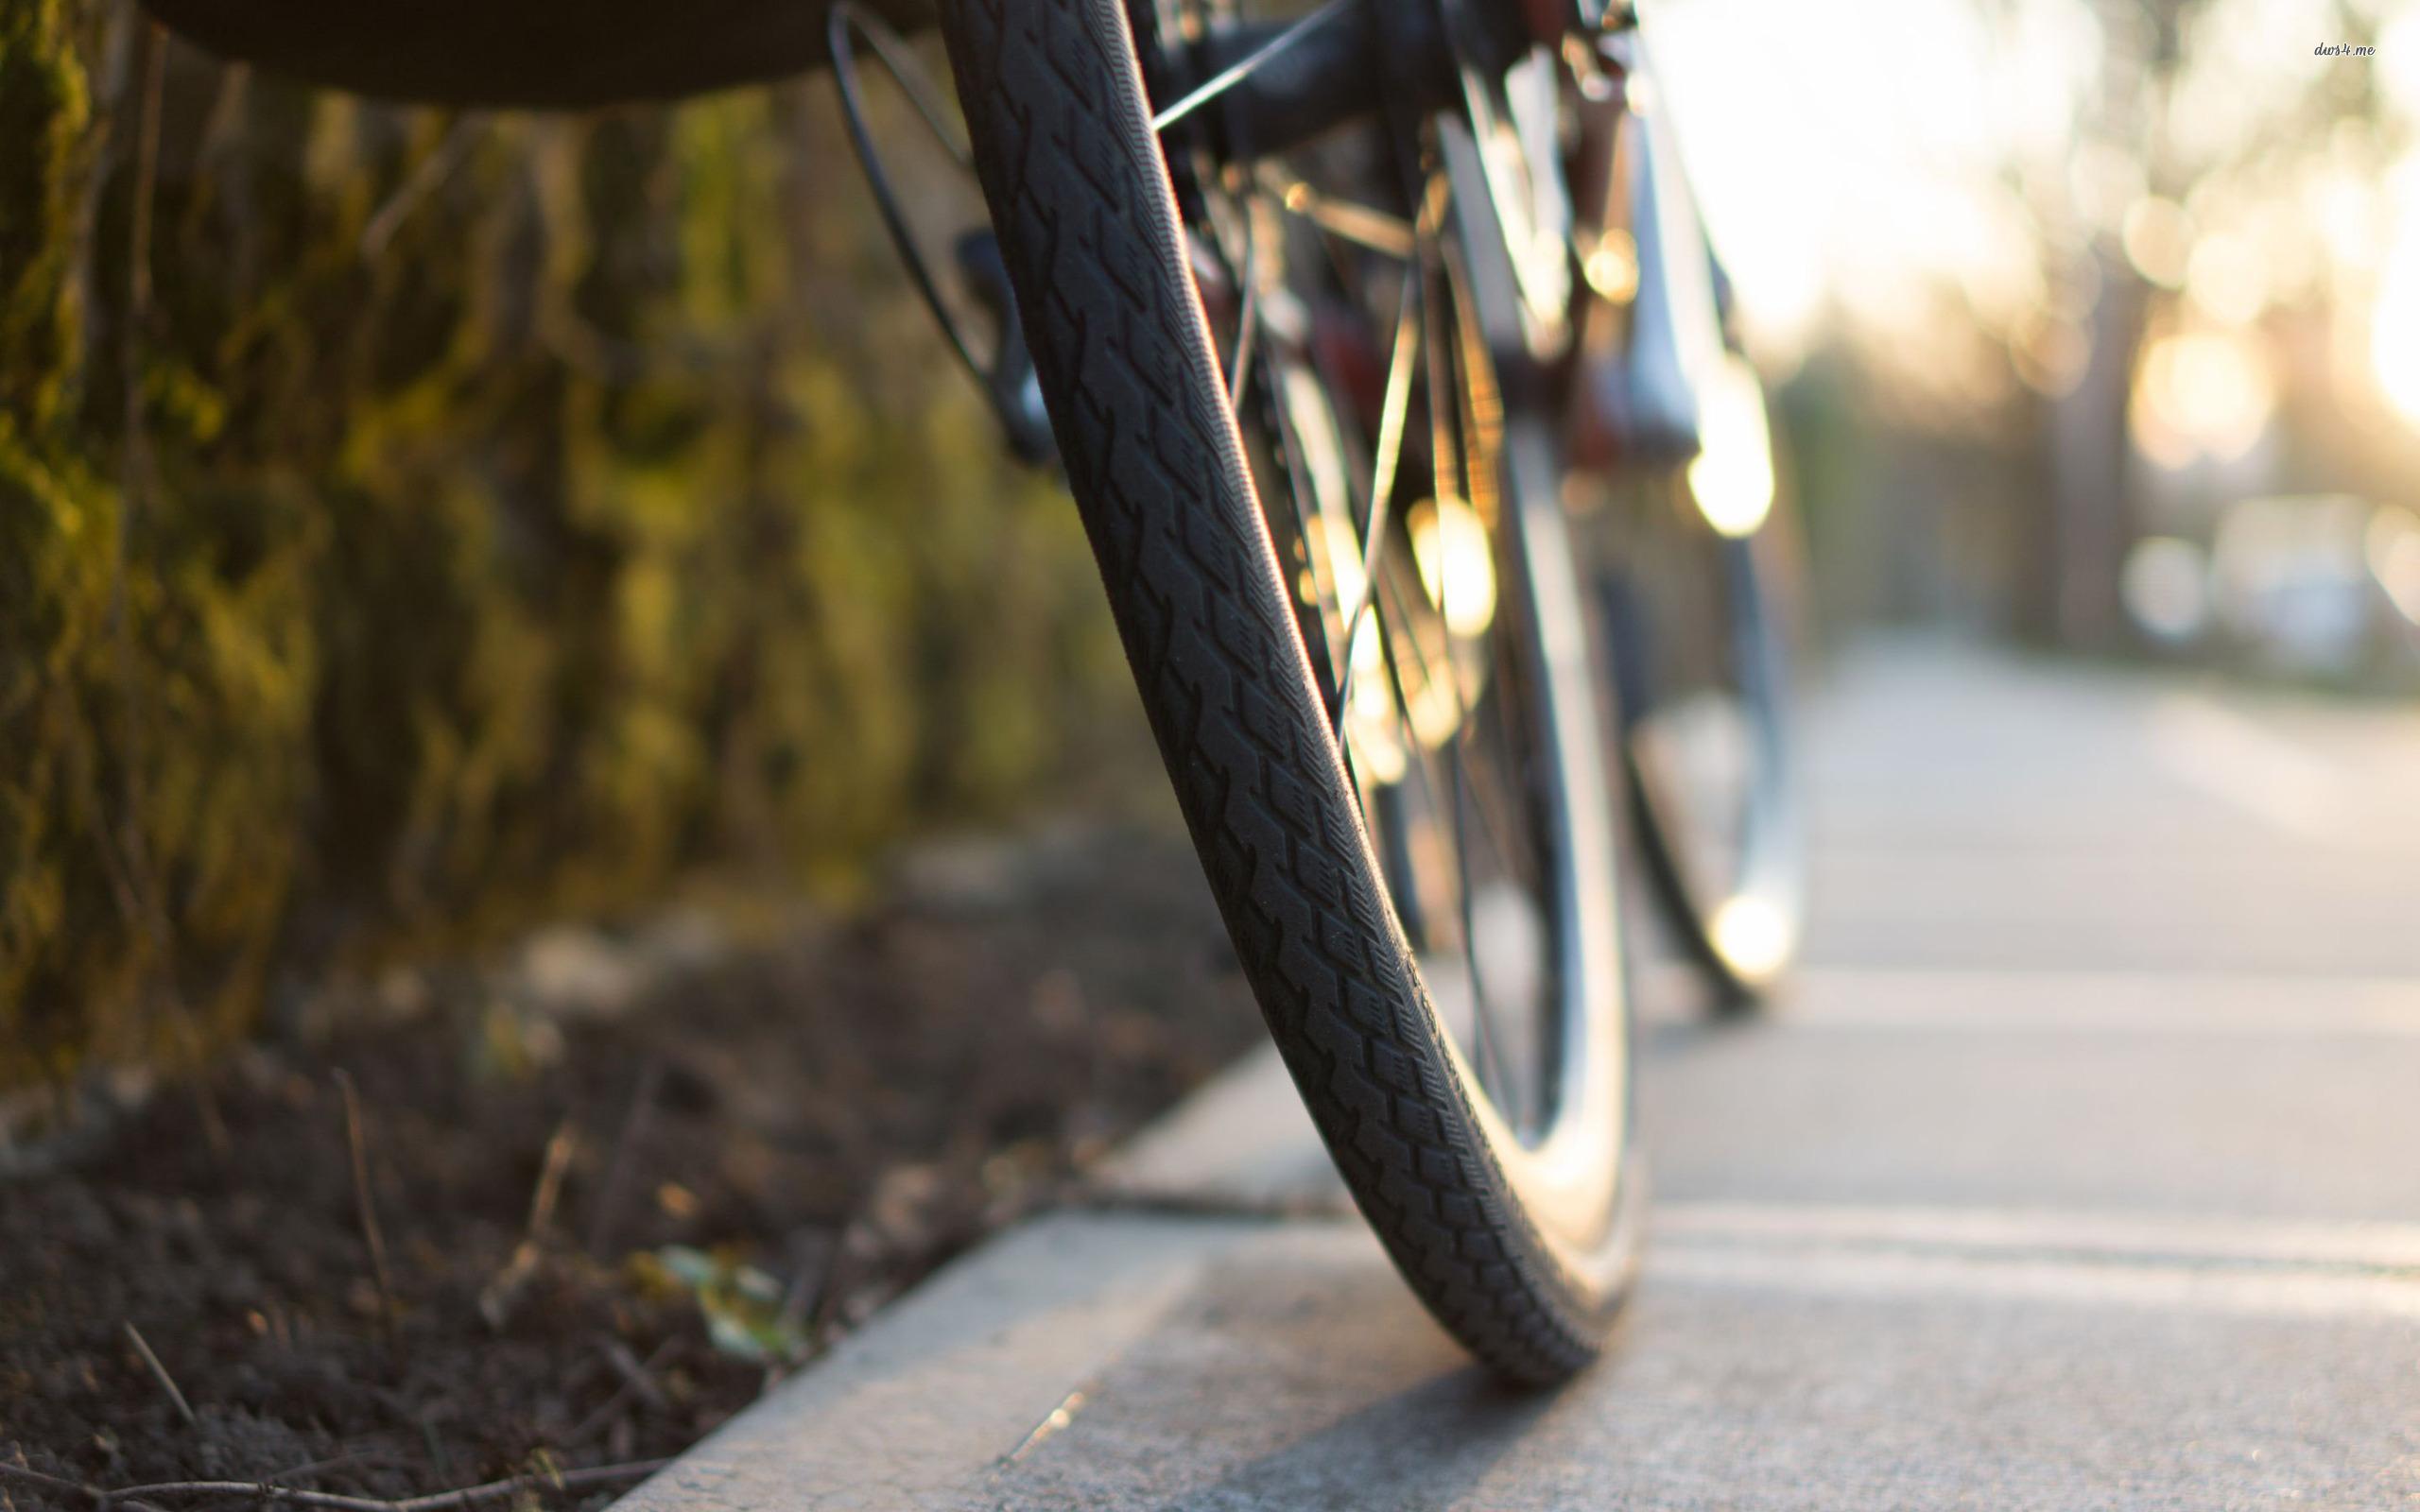 Vélo Fond d'écran HD | Arrière-Plan | 2560x1600 | ID:515102 - Wallpaper Abyss